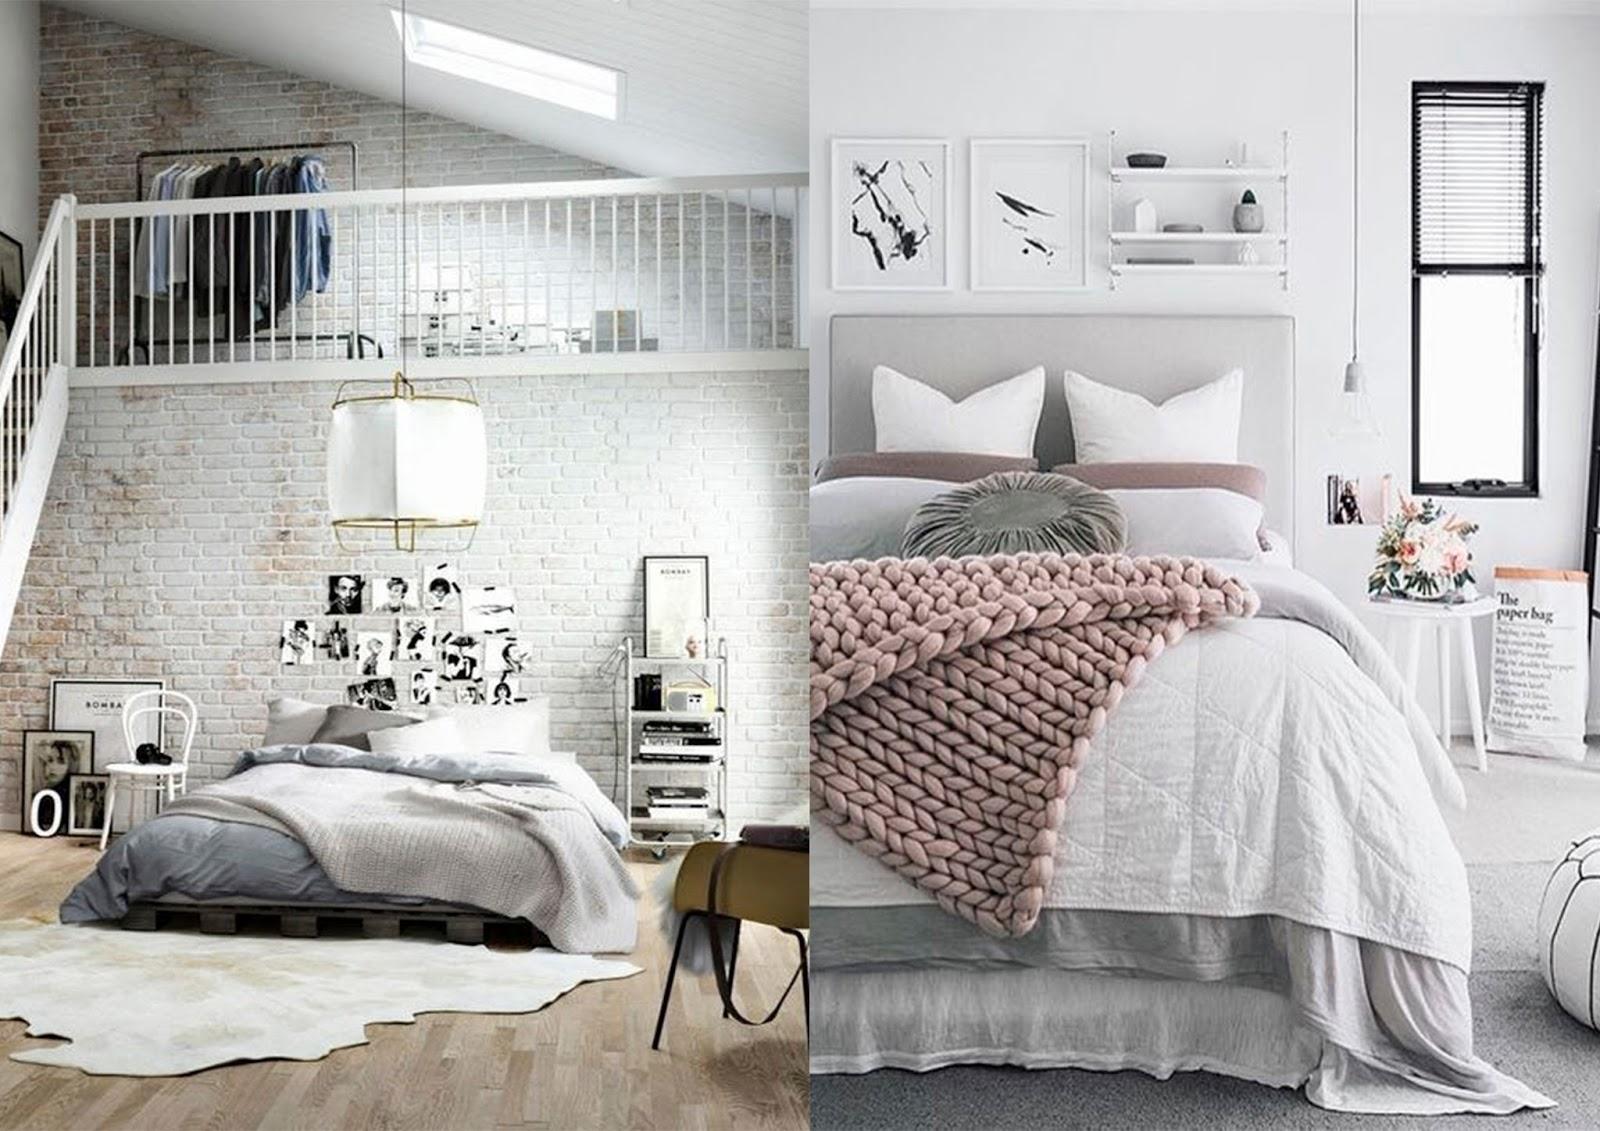 Monicositas blog de moda ni os y lifestyle de barcelona for Habitacion matrimonio gris